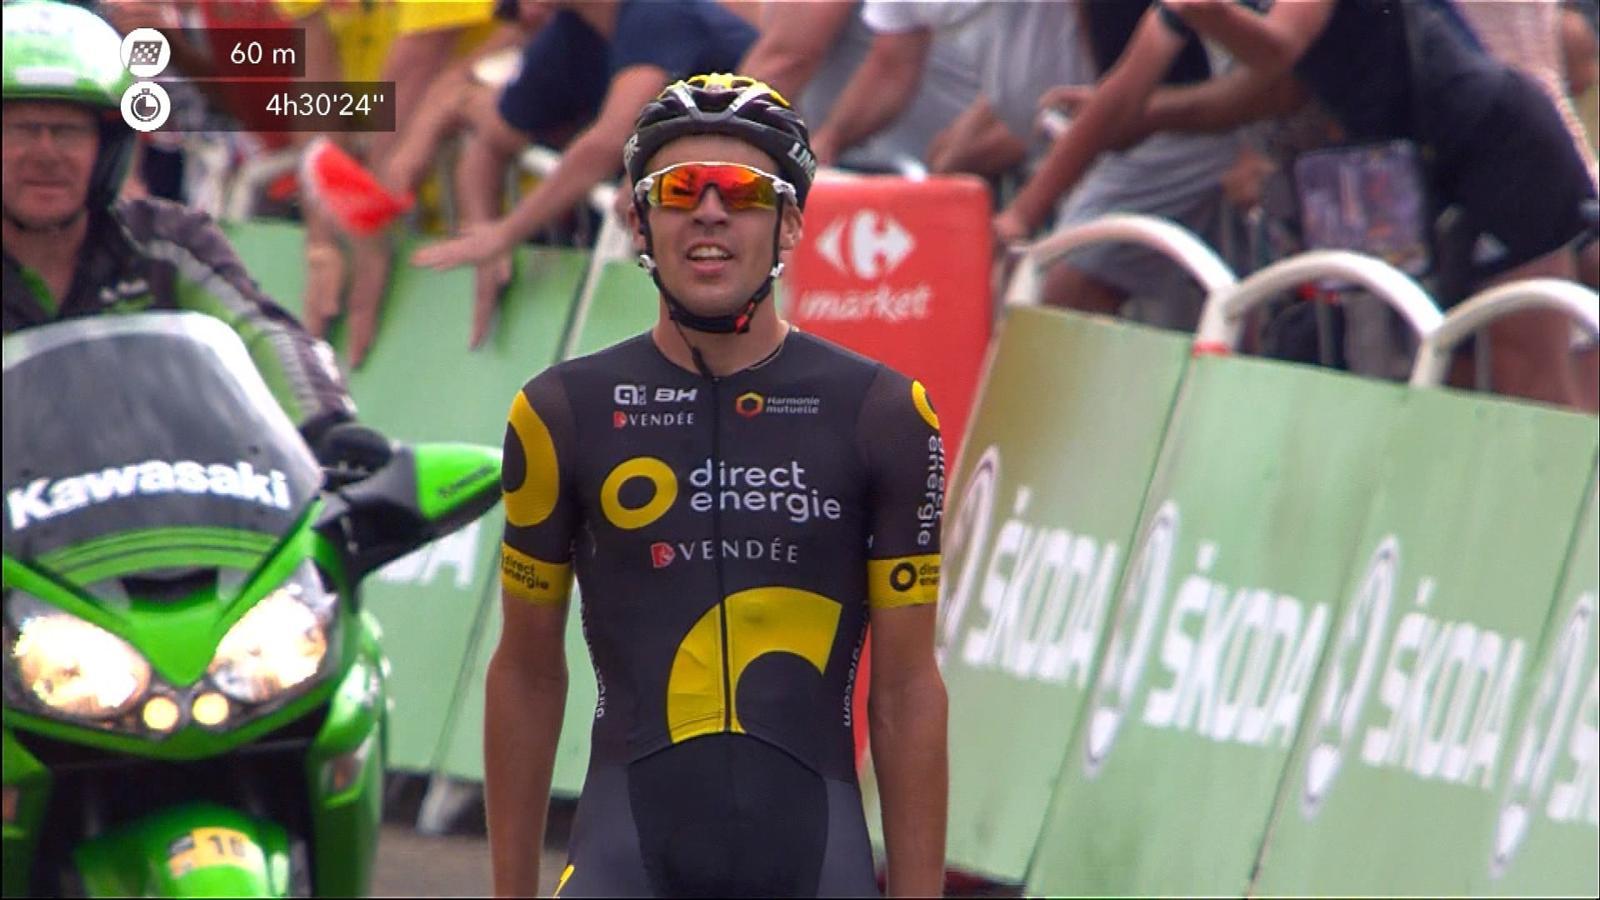 VIDEO - Tour de France 2017  Finish  Lilian Calmejane beats cramp to win  Stage 8 - Tour de France - Video Eurosport UK 689126c05